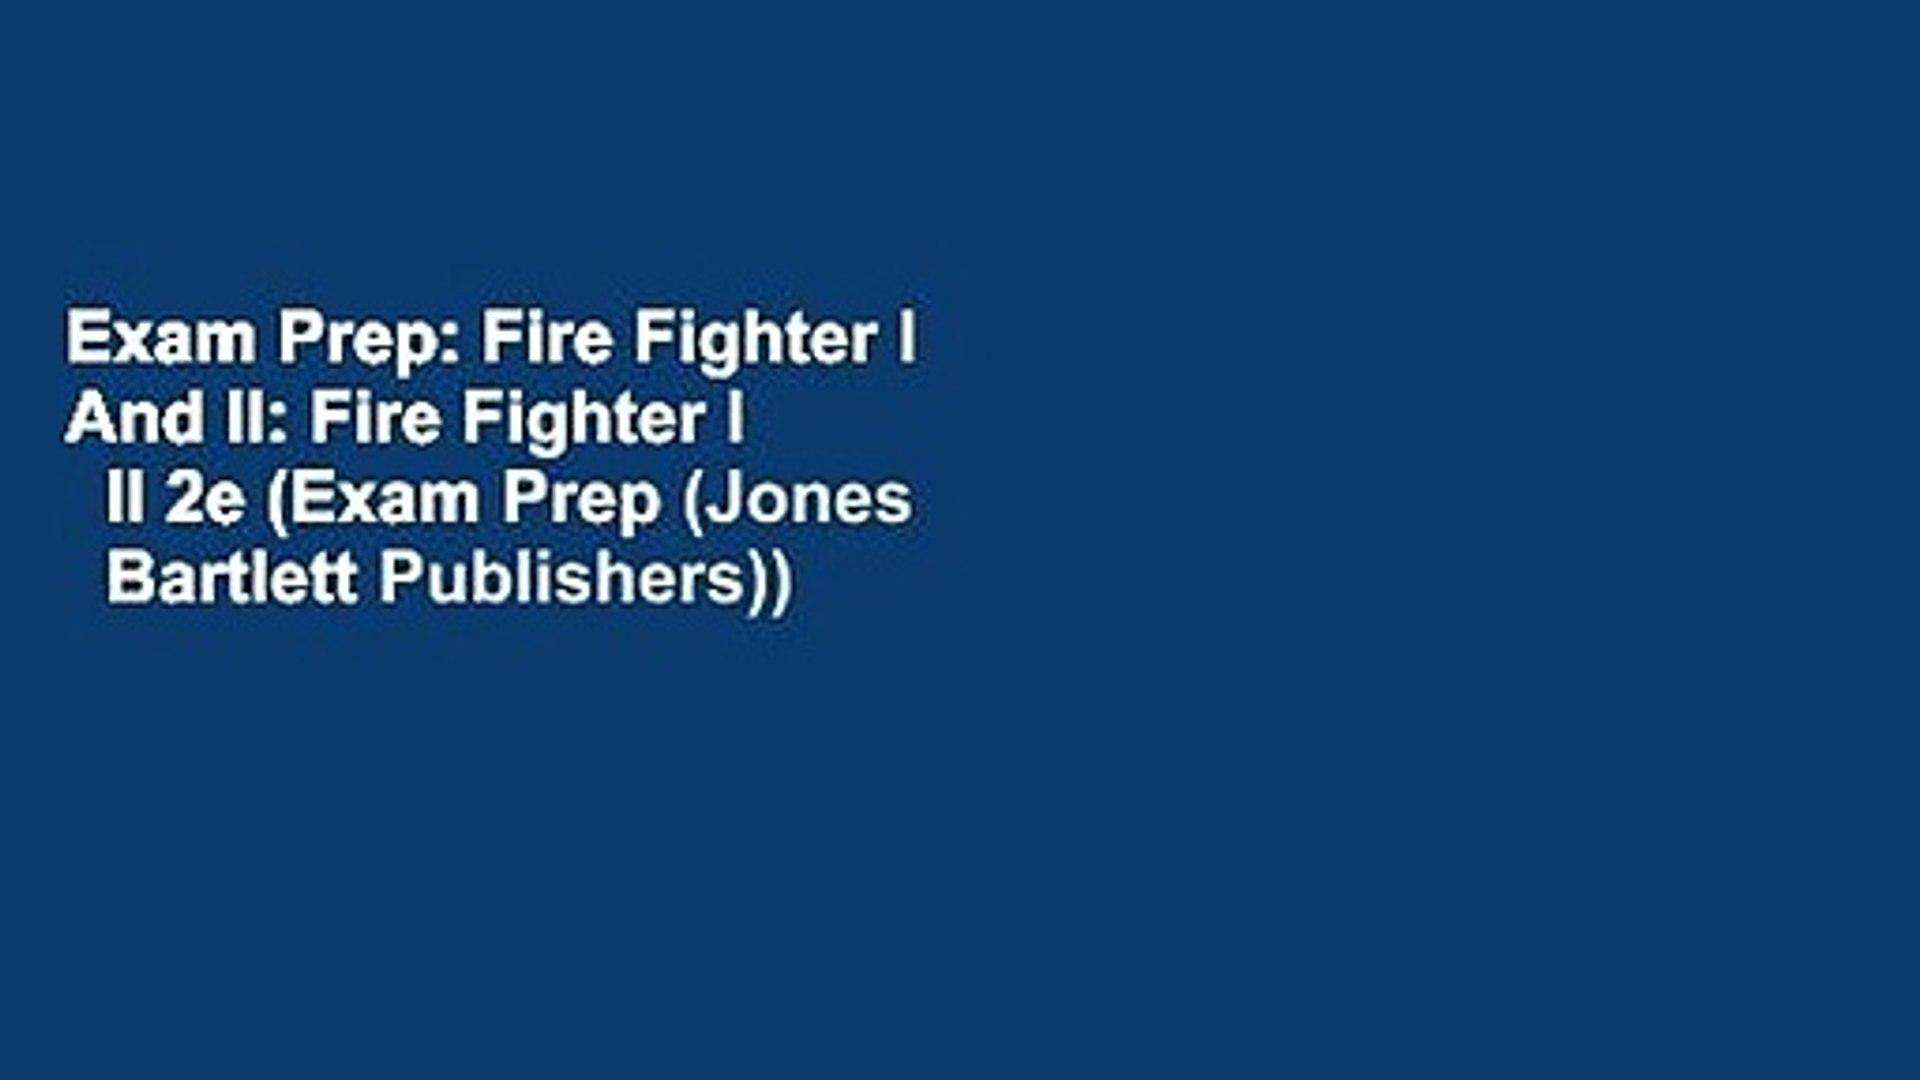 Exam Prep: Fire Fighter I And II: Fire Fighter I   II 2e (Exam Prep (Jones   Bartlett Publishers))